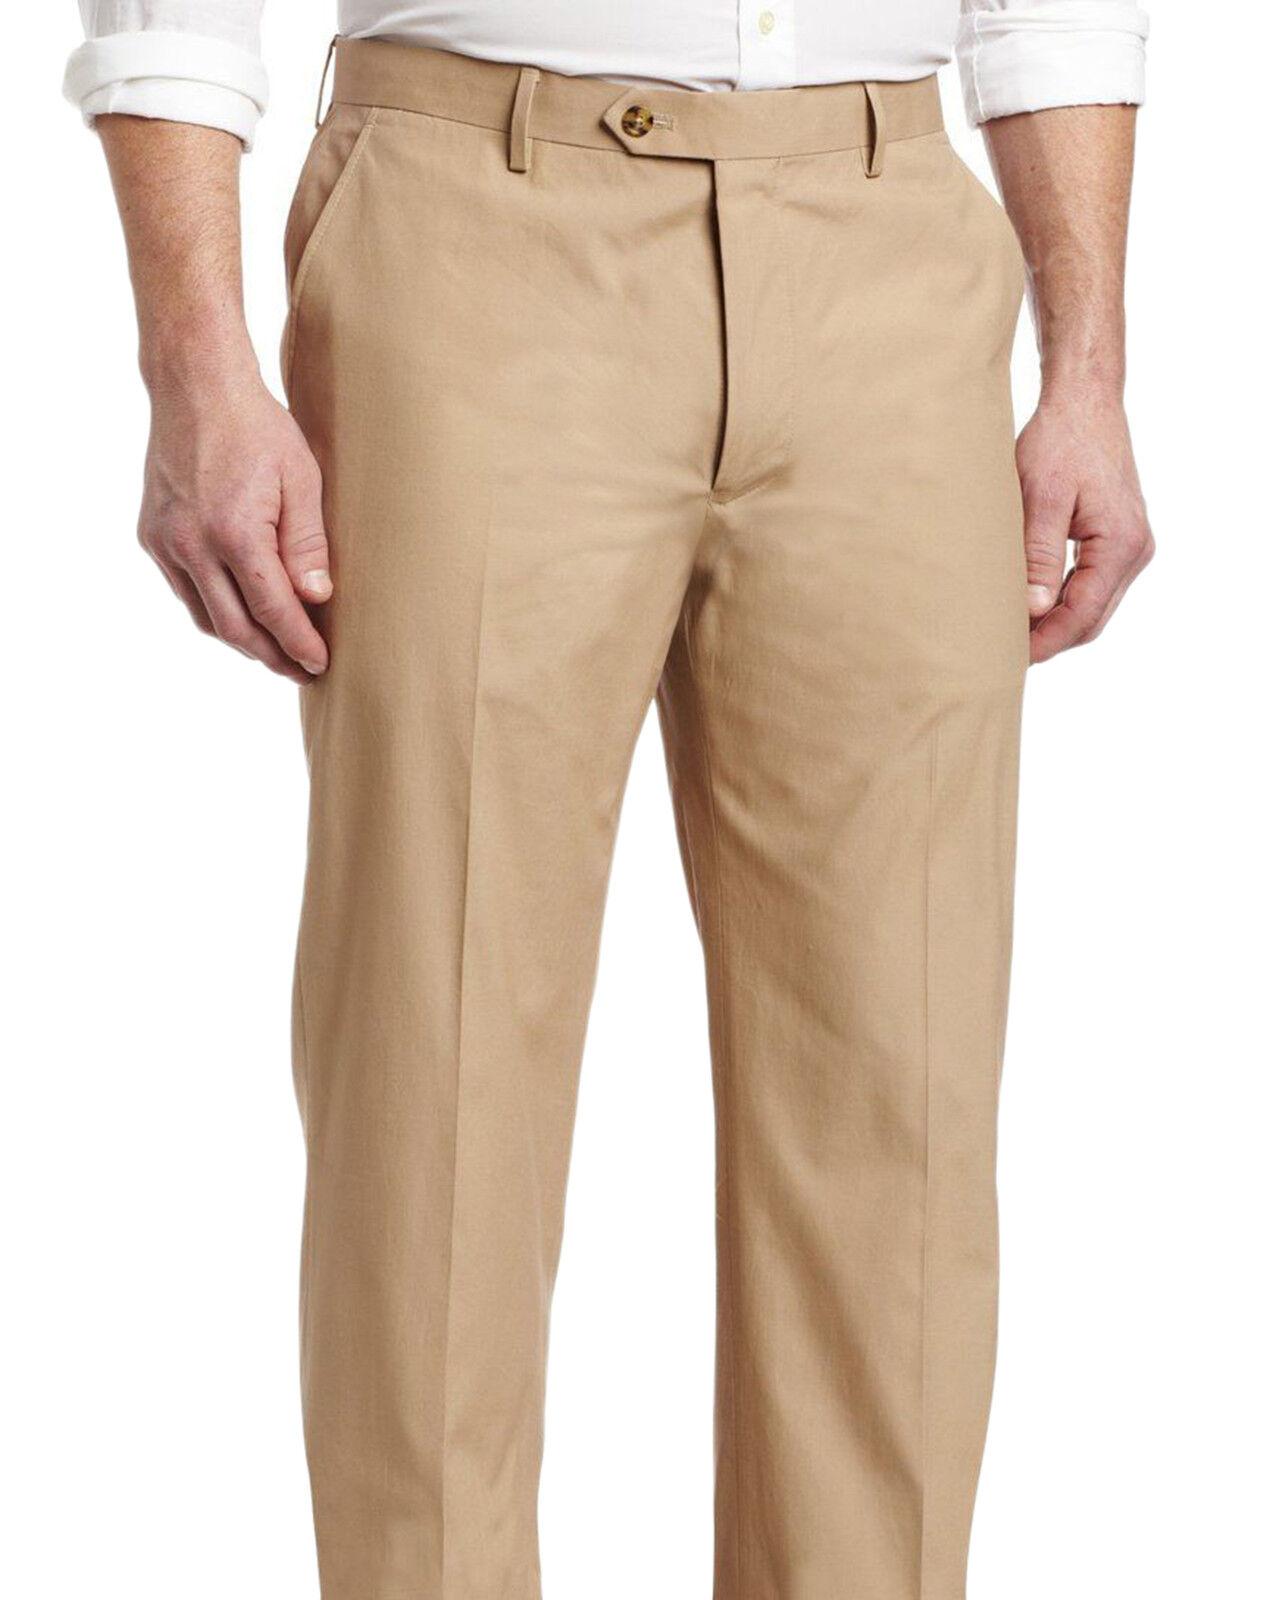 Nautica Classic Fit Solid Tan Flat Front Wool Dress Pants